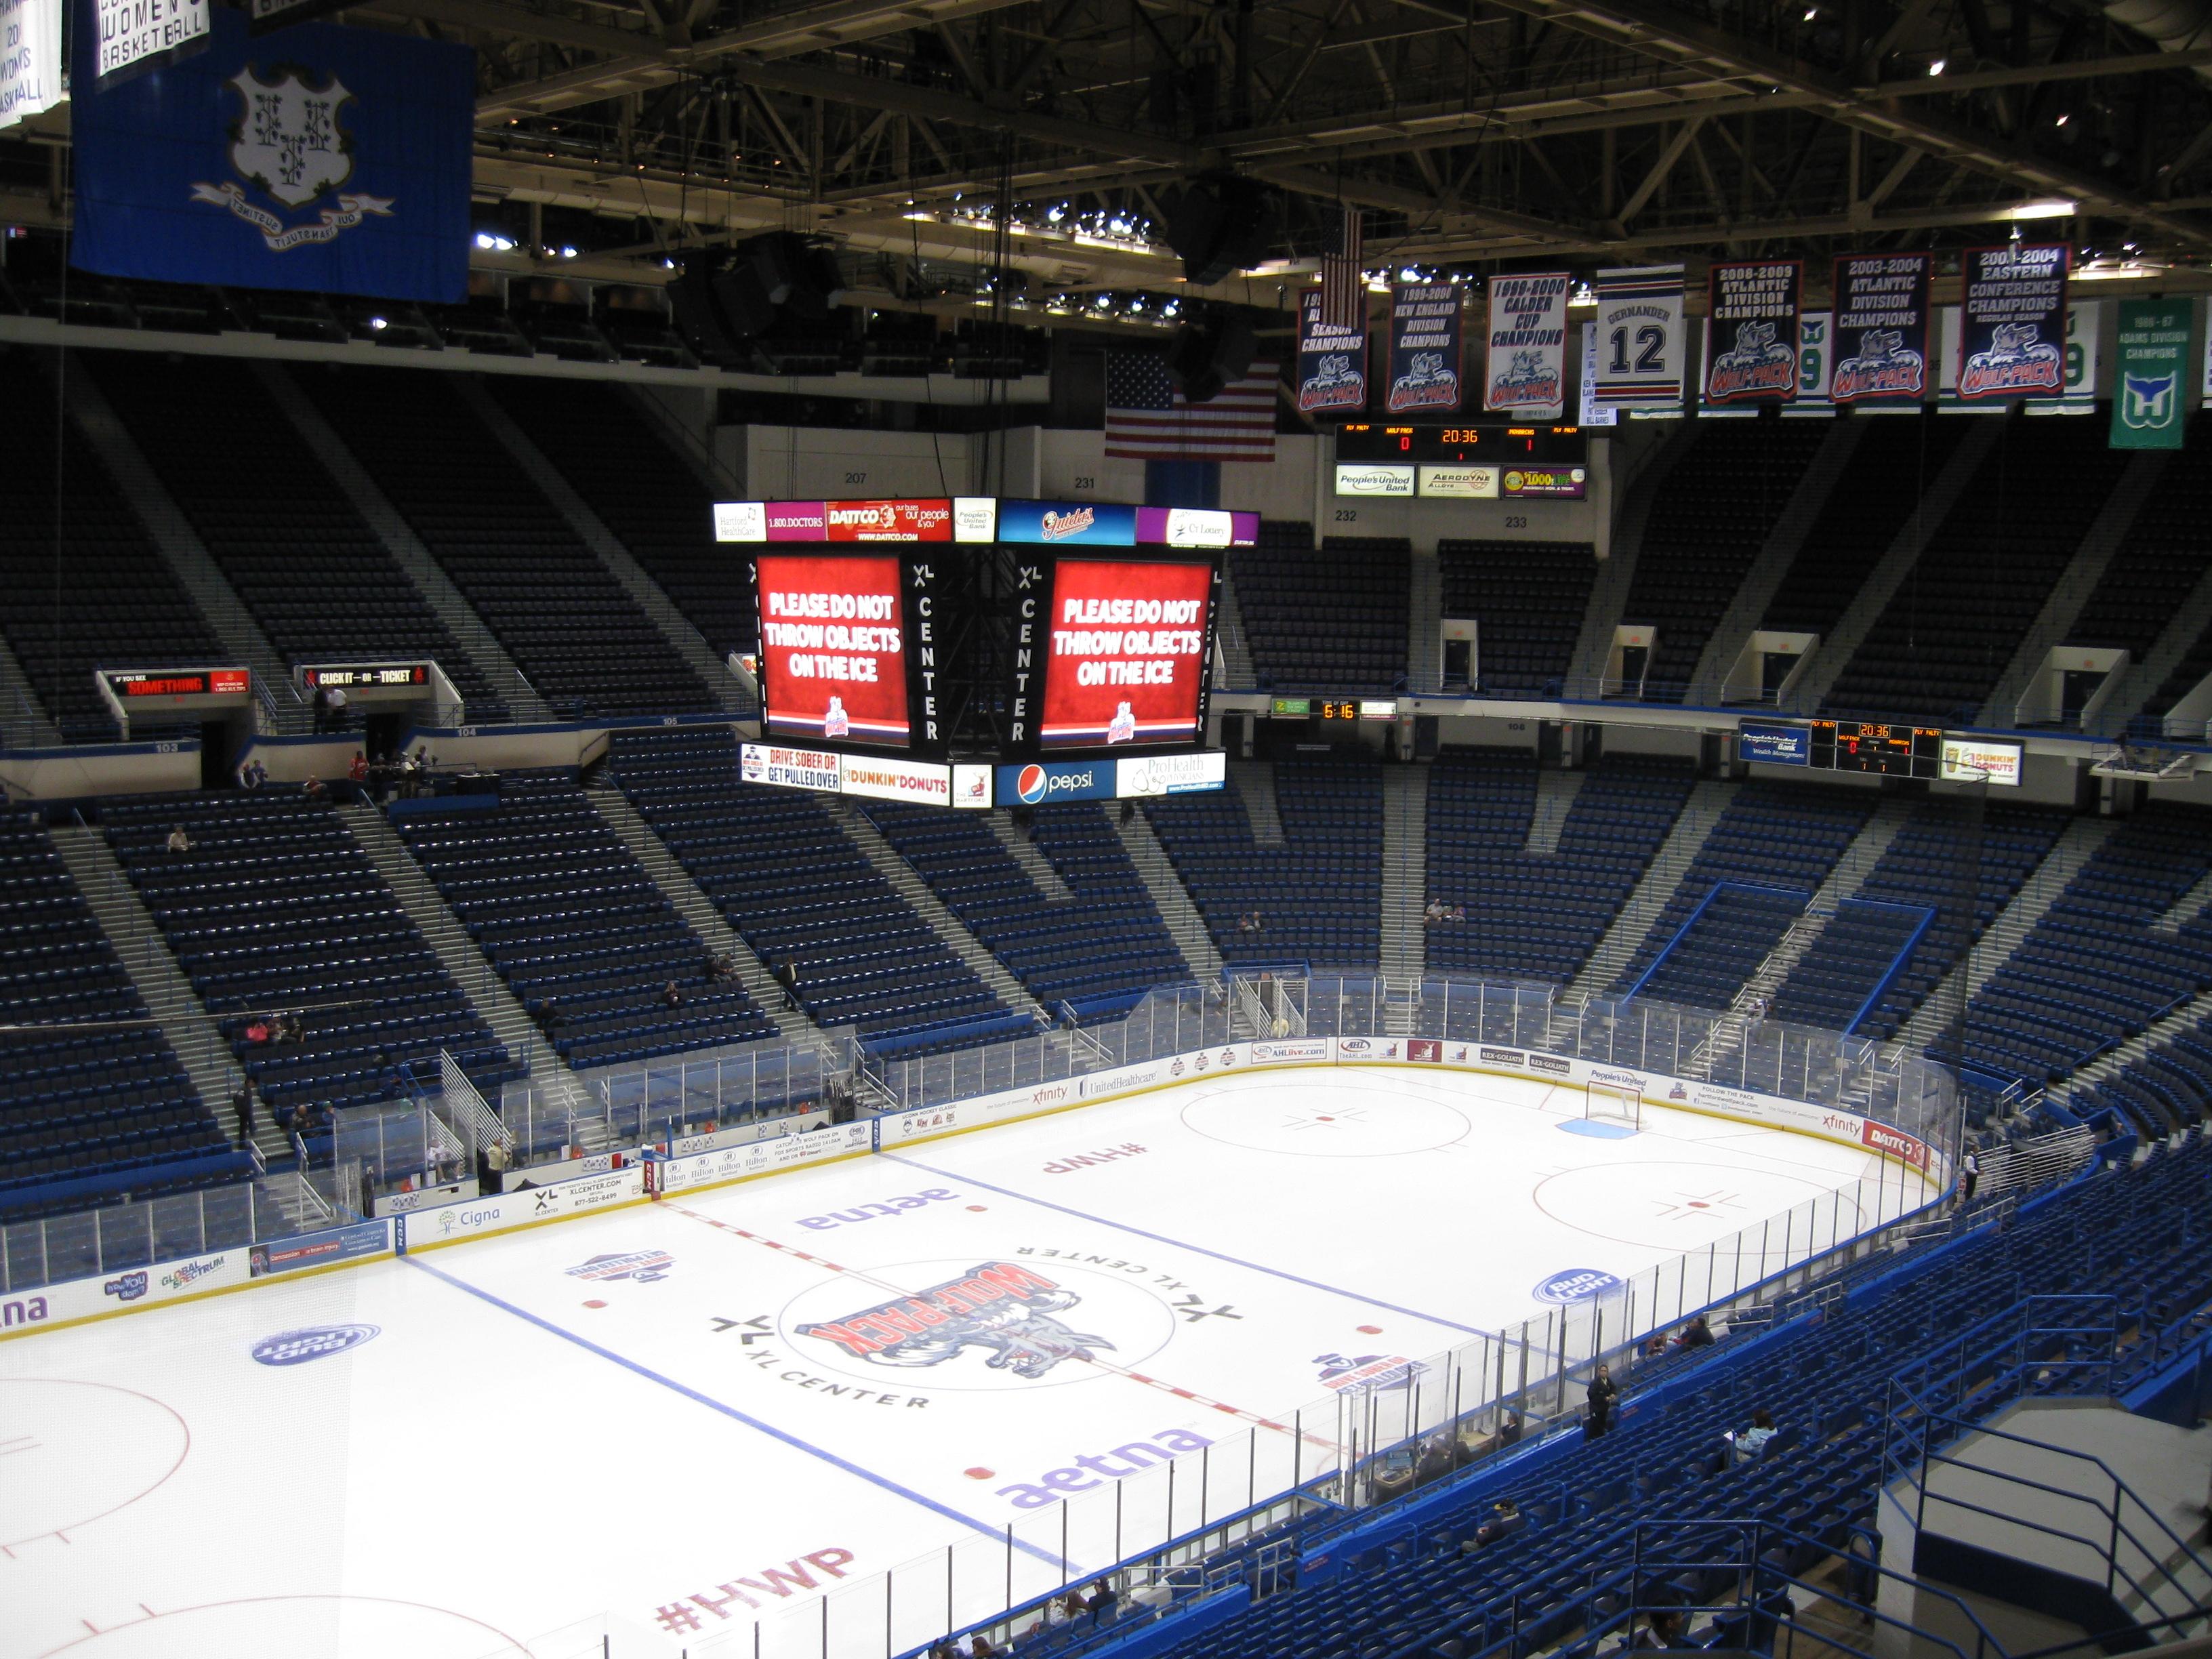 137 Xl Center 171 Stadium And Arena Visits